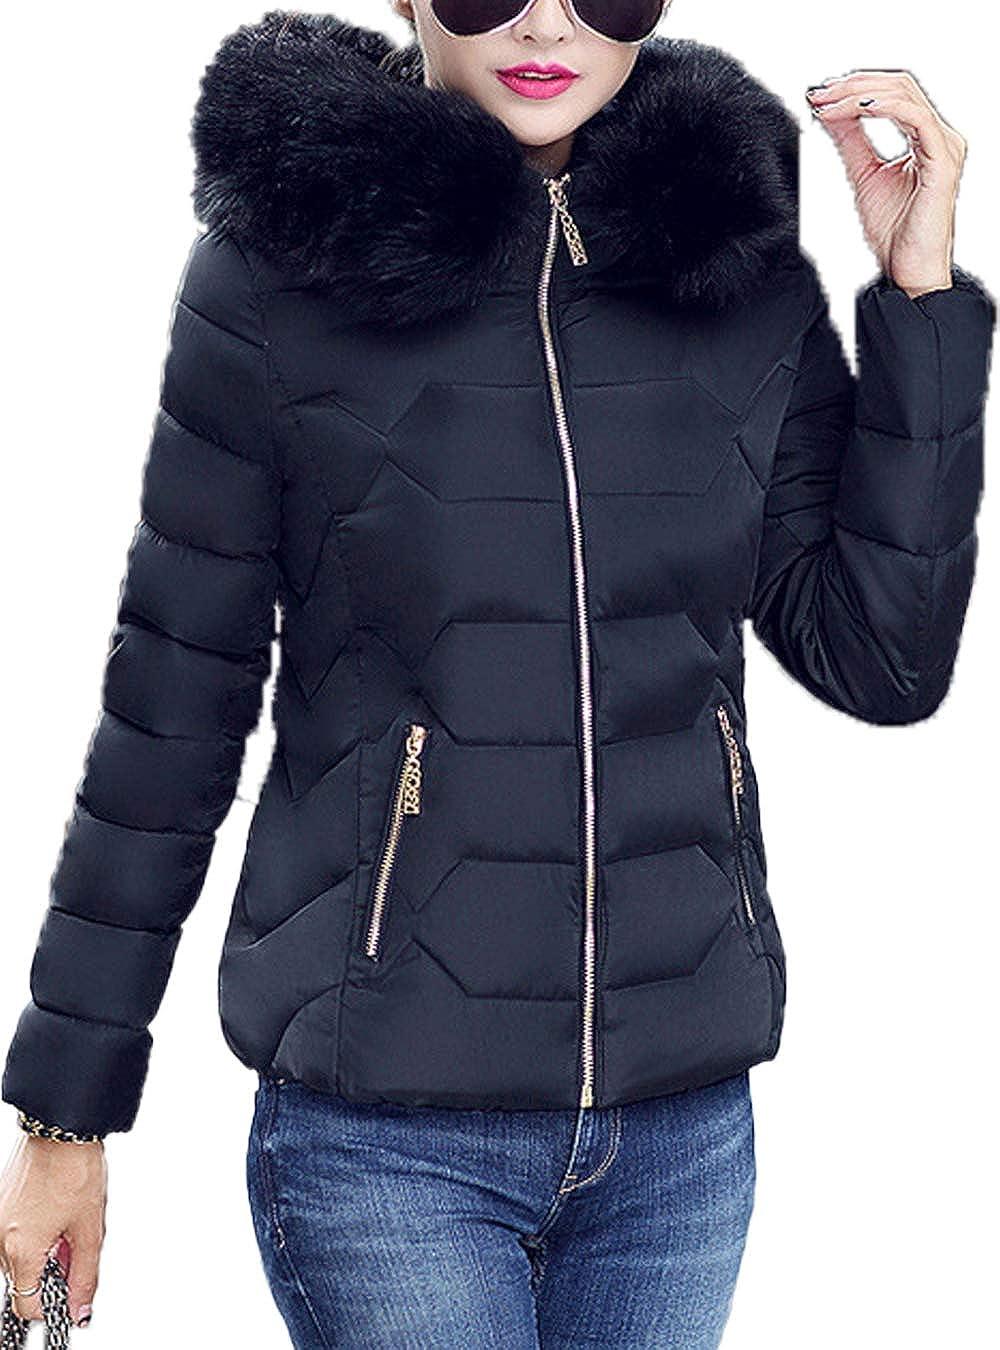 Women Down Jacket Hooded Padded Zipper Outwear Lightweight Jackets Quilted Parkas